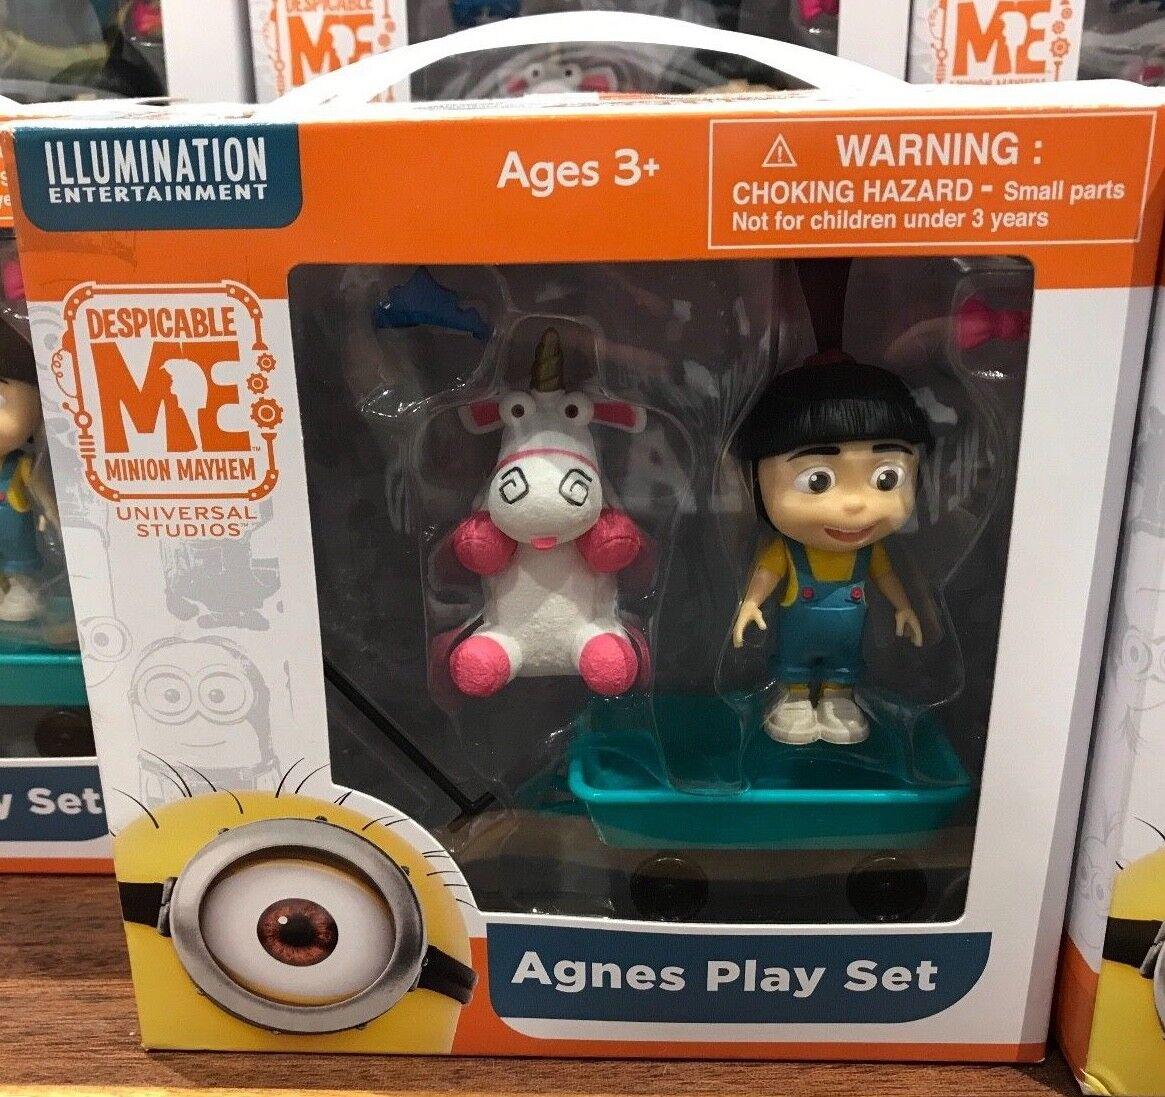 Universal Studios Despicable Me Agnes Figure Play Set Toys & Fluffy Unicorn New